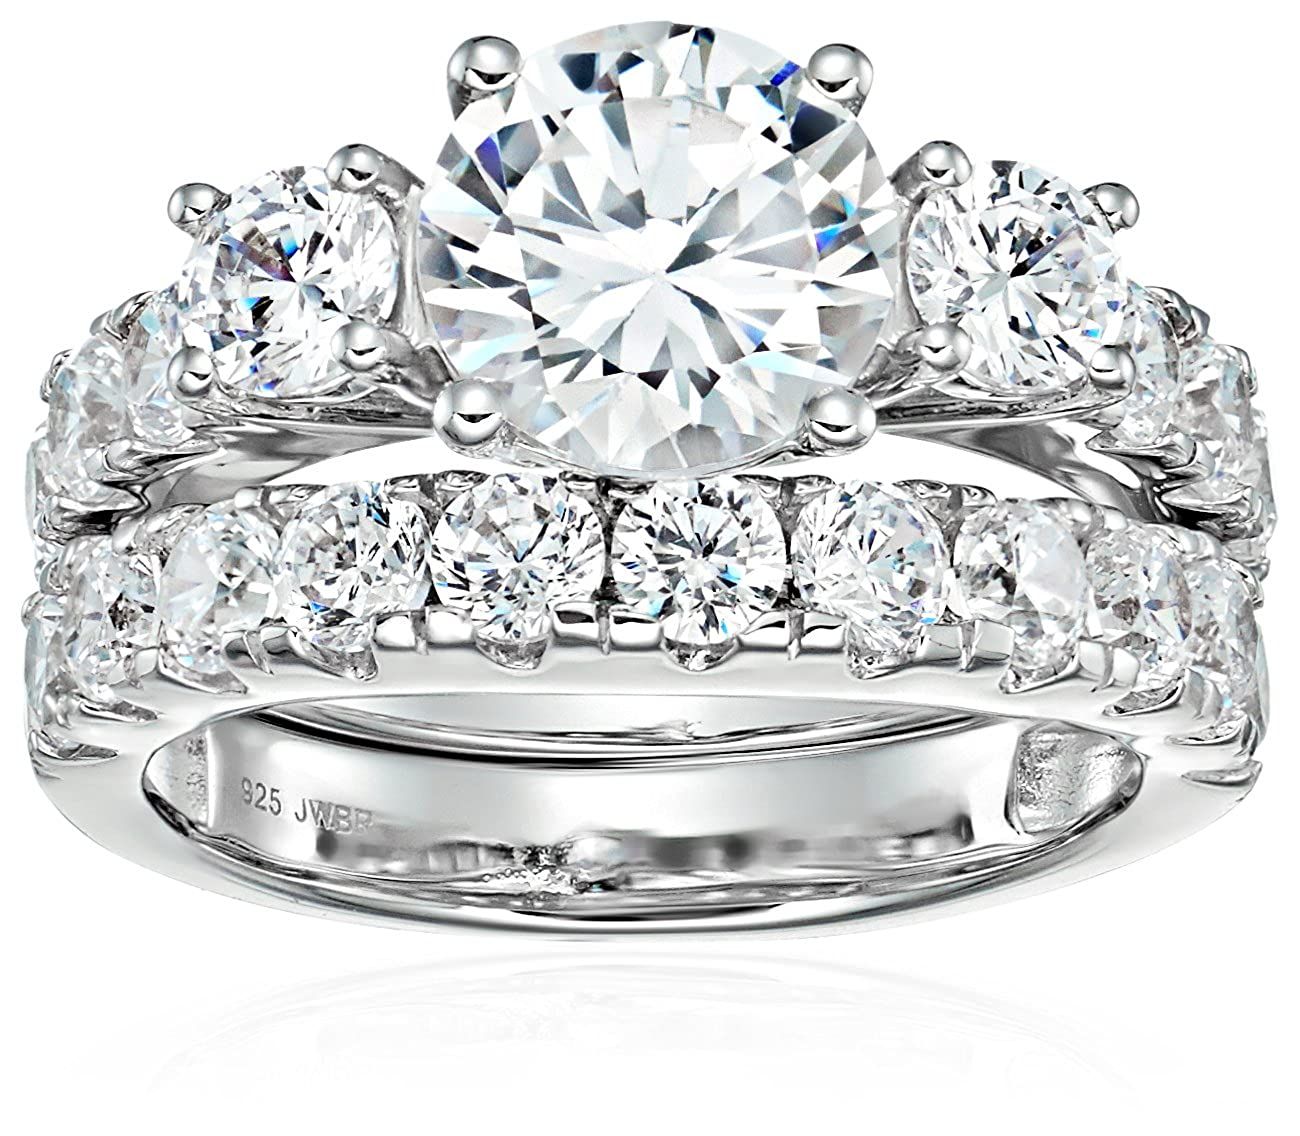 Sterling Silver Cubic Zirconia Round, 3-Stone Bridal Set, Size 6 482321/STGSIL/ZZ/US6